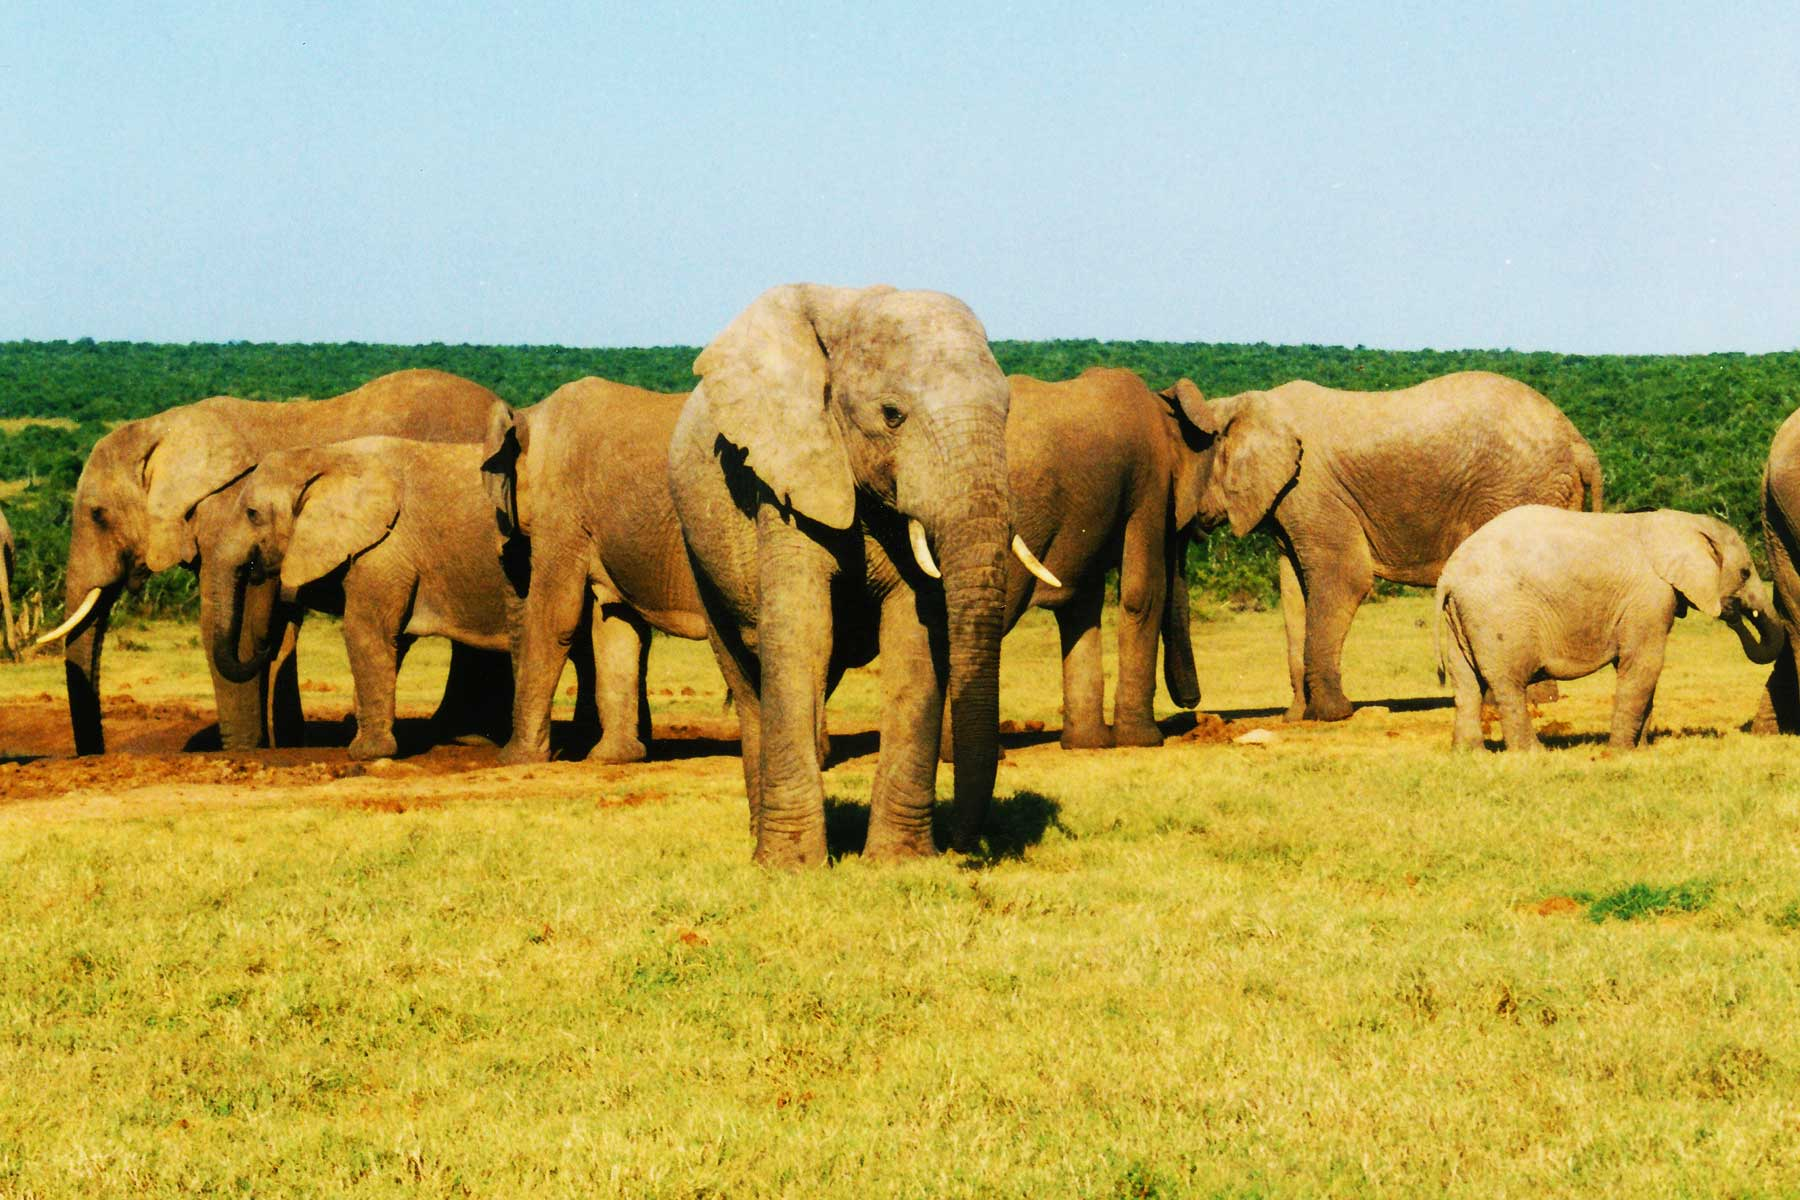 Addo Elephant National Park | South Africa | Dr Steven Andrew Martin | Wildlife Conservation | School for International Training